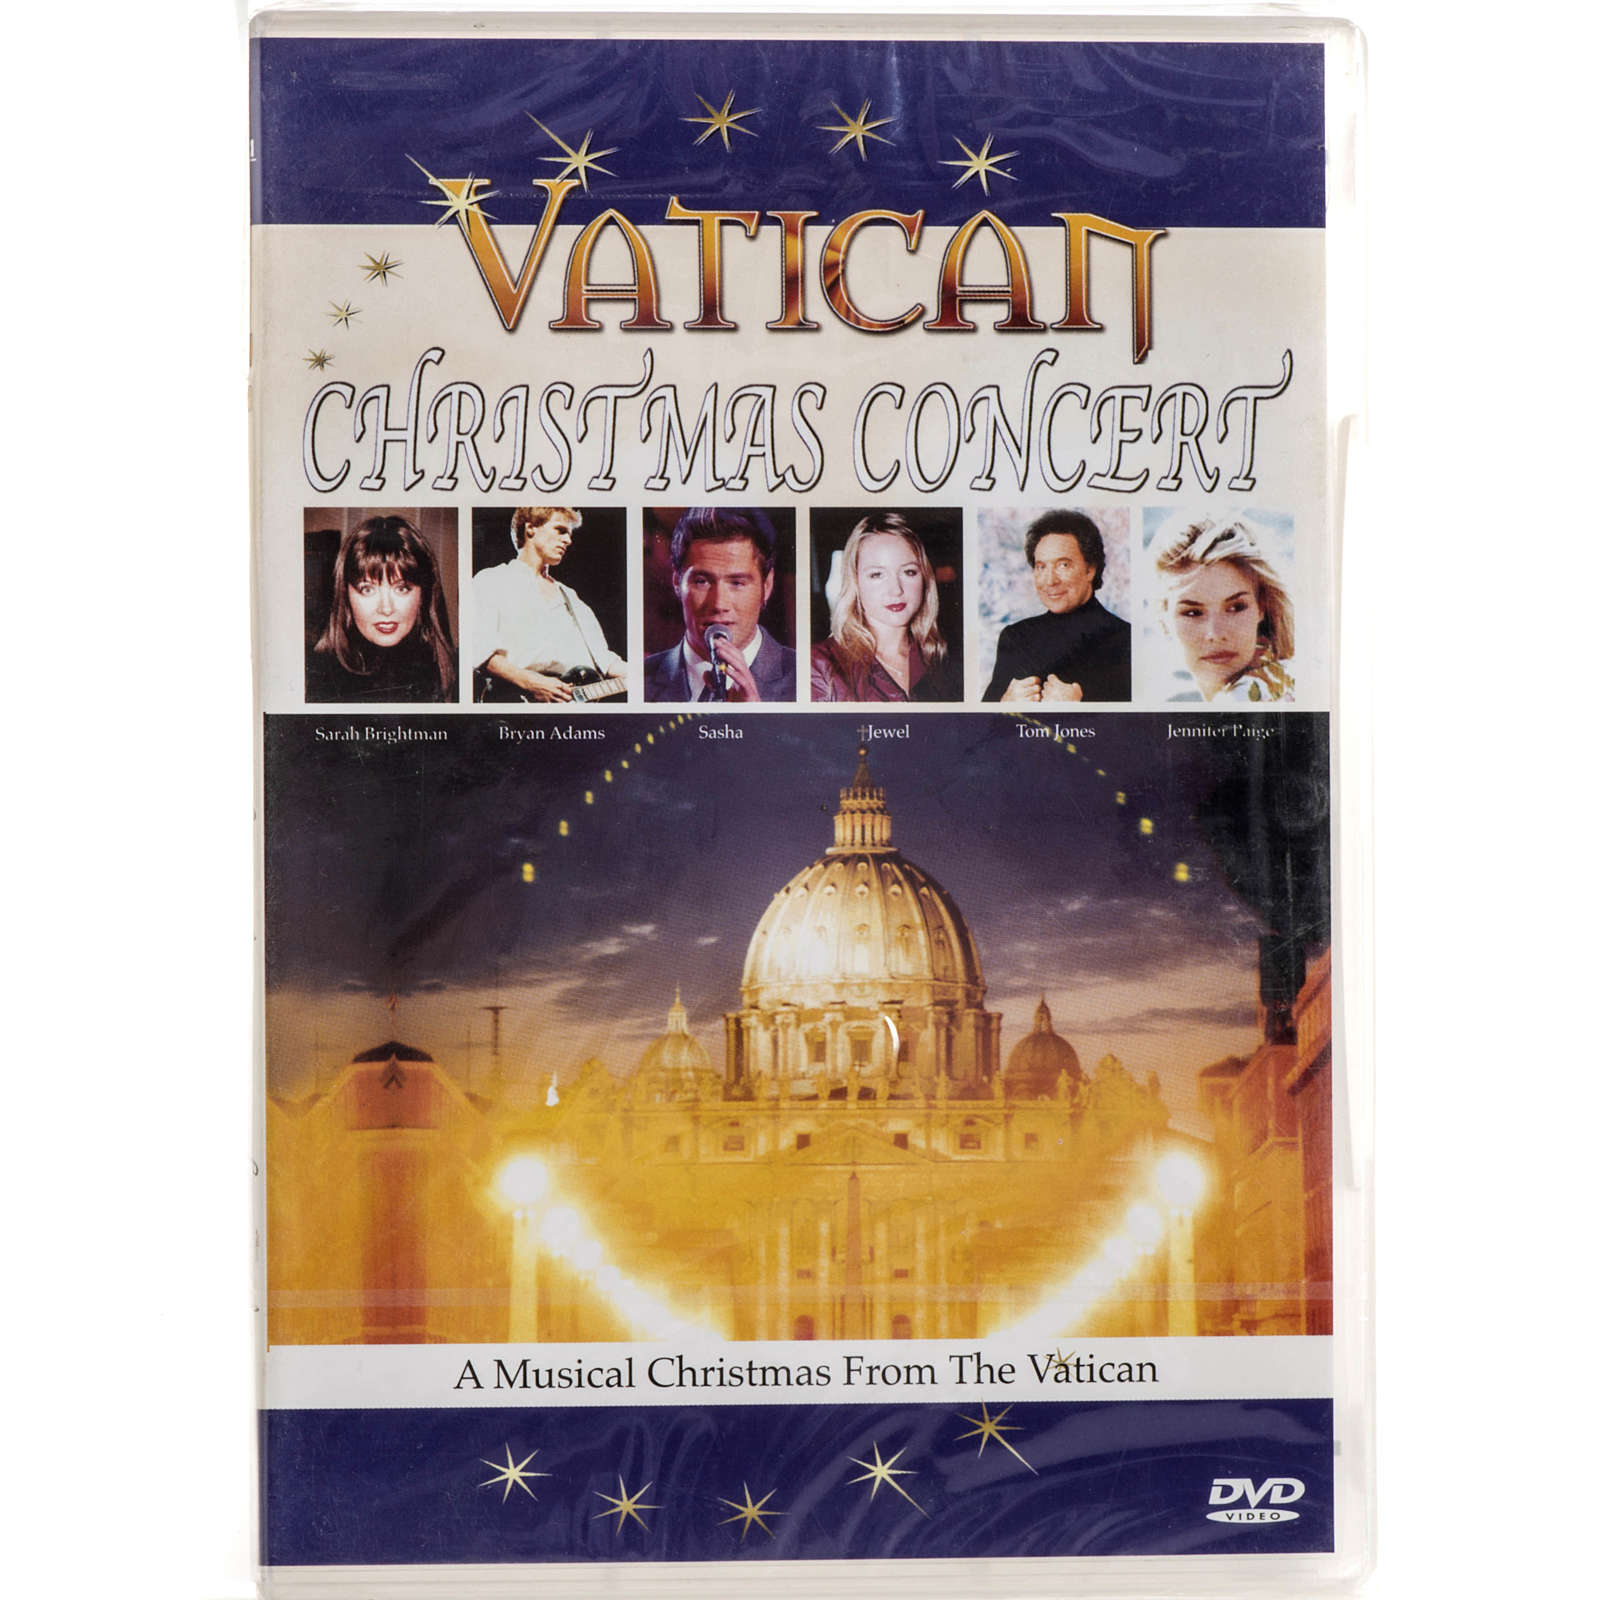 Vatican Christmas Concert 3